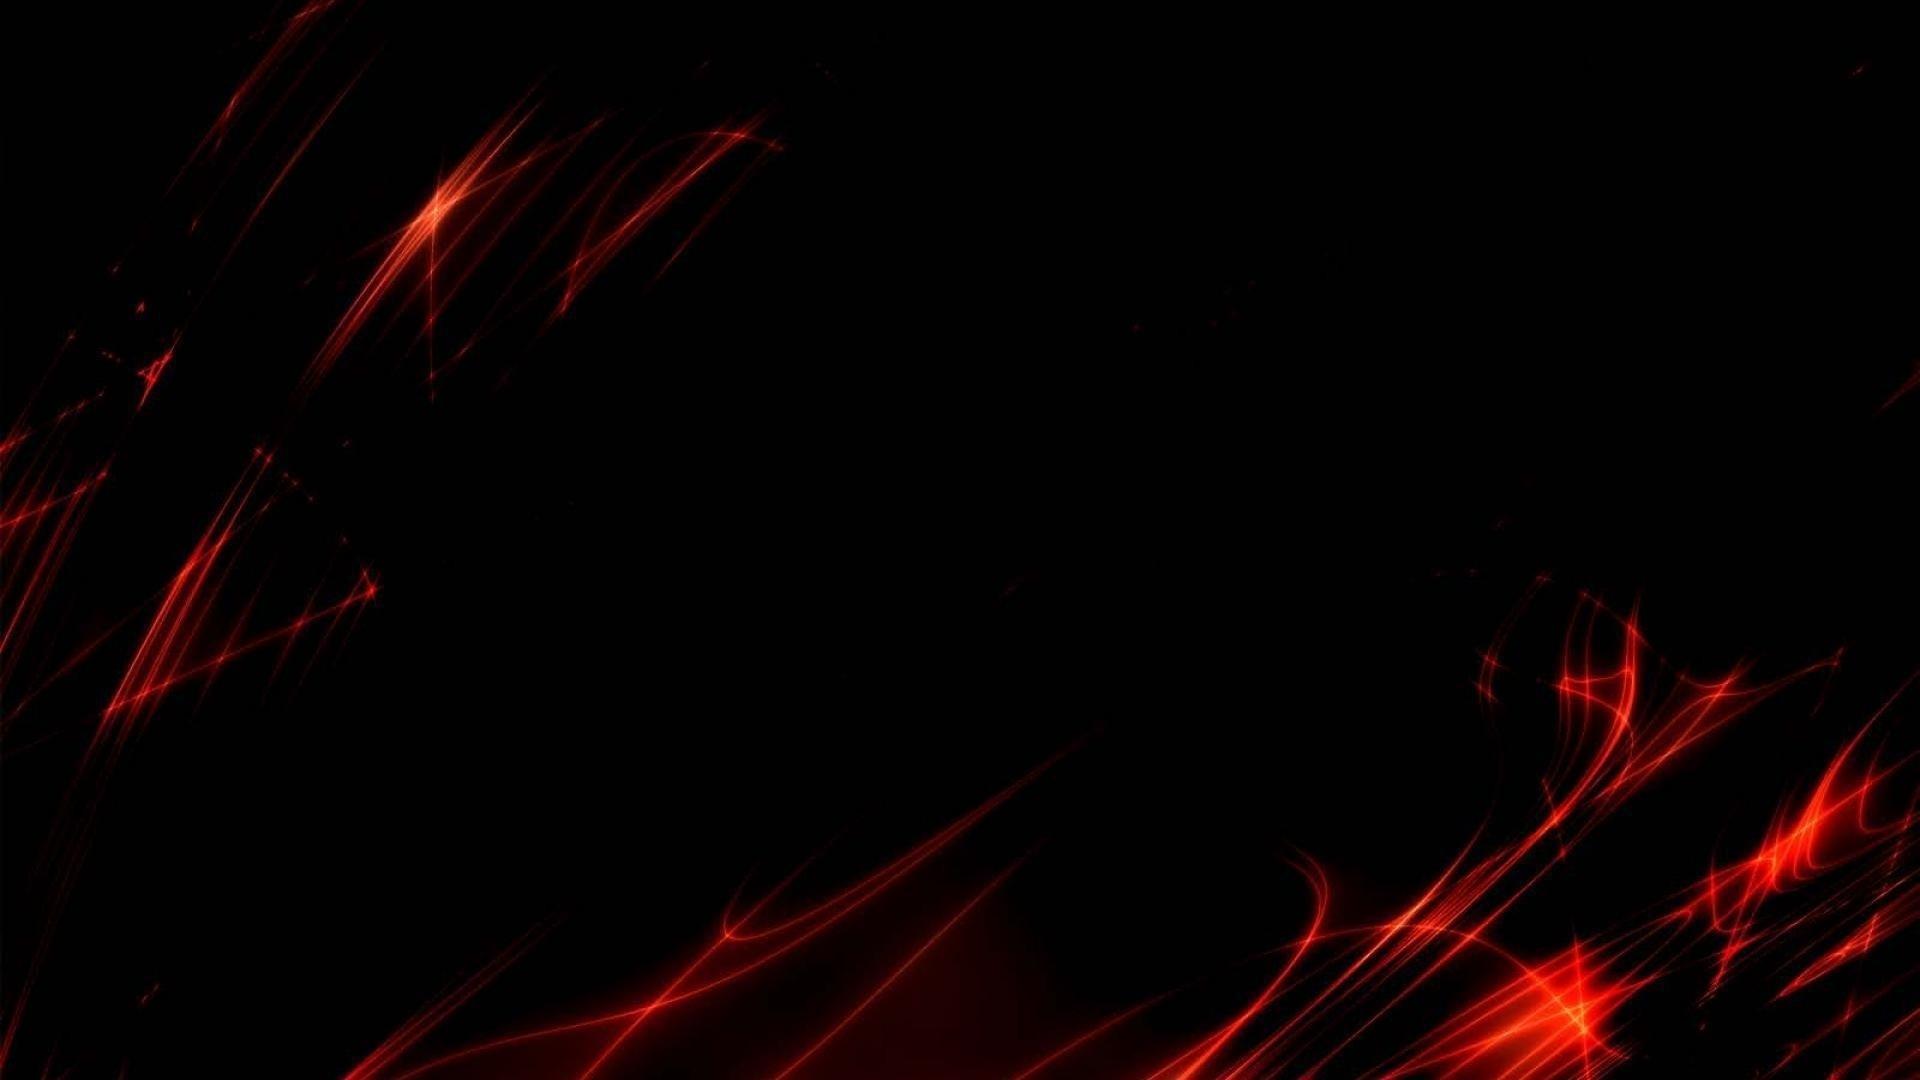 dark red wallpaper hd (65+ images)